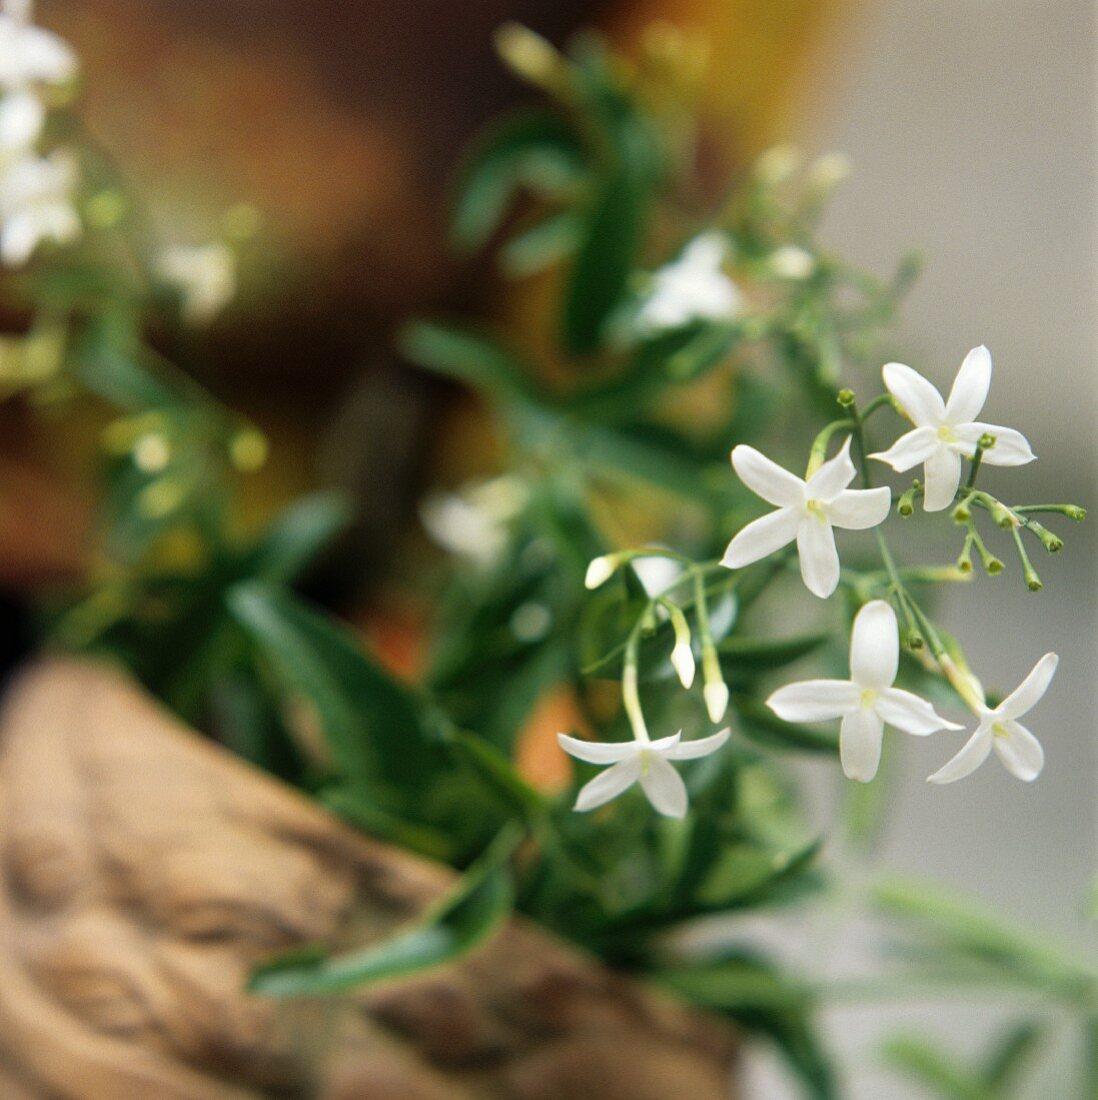 Flowering jasmine (Jasminum officin., for oil, tea)